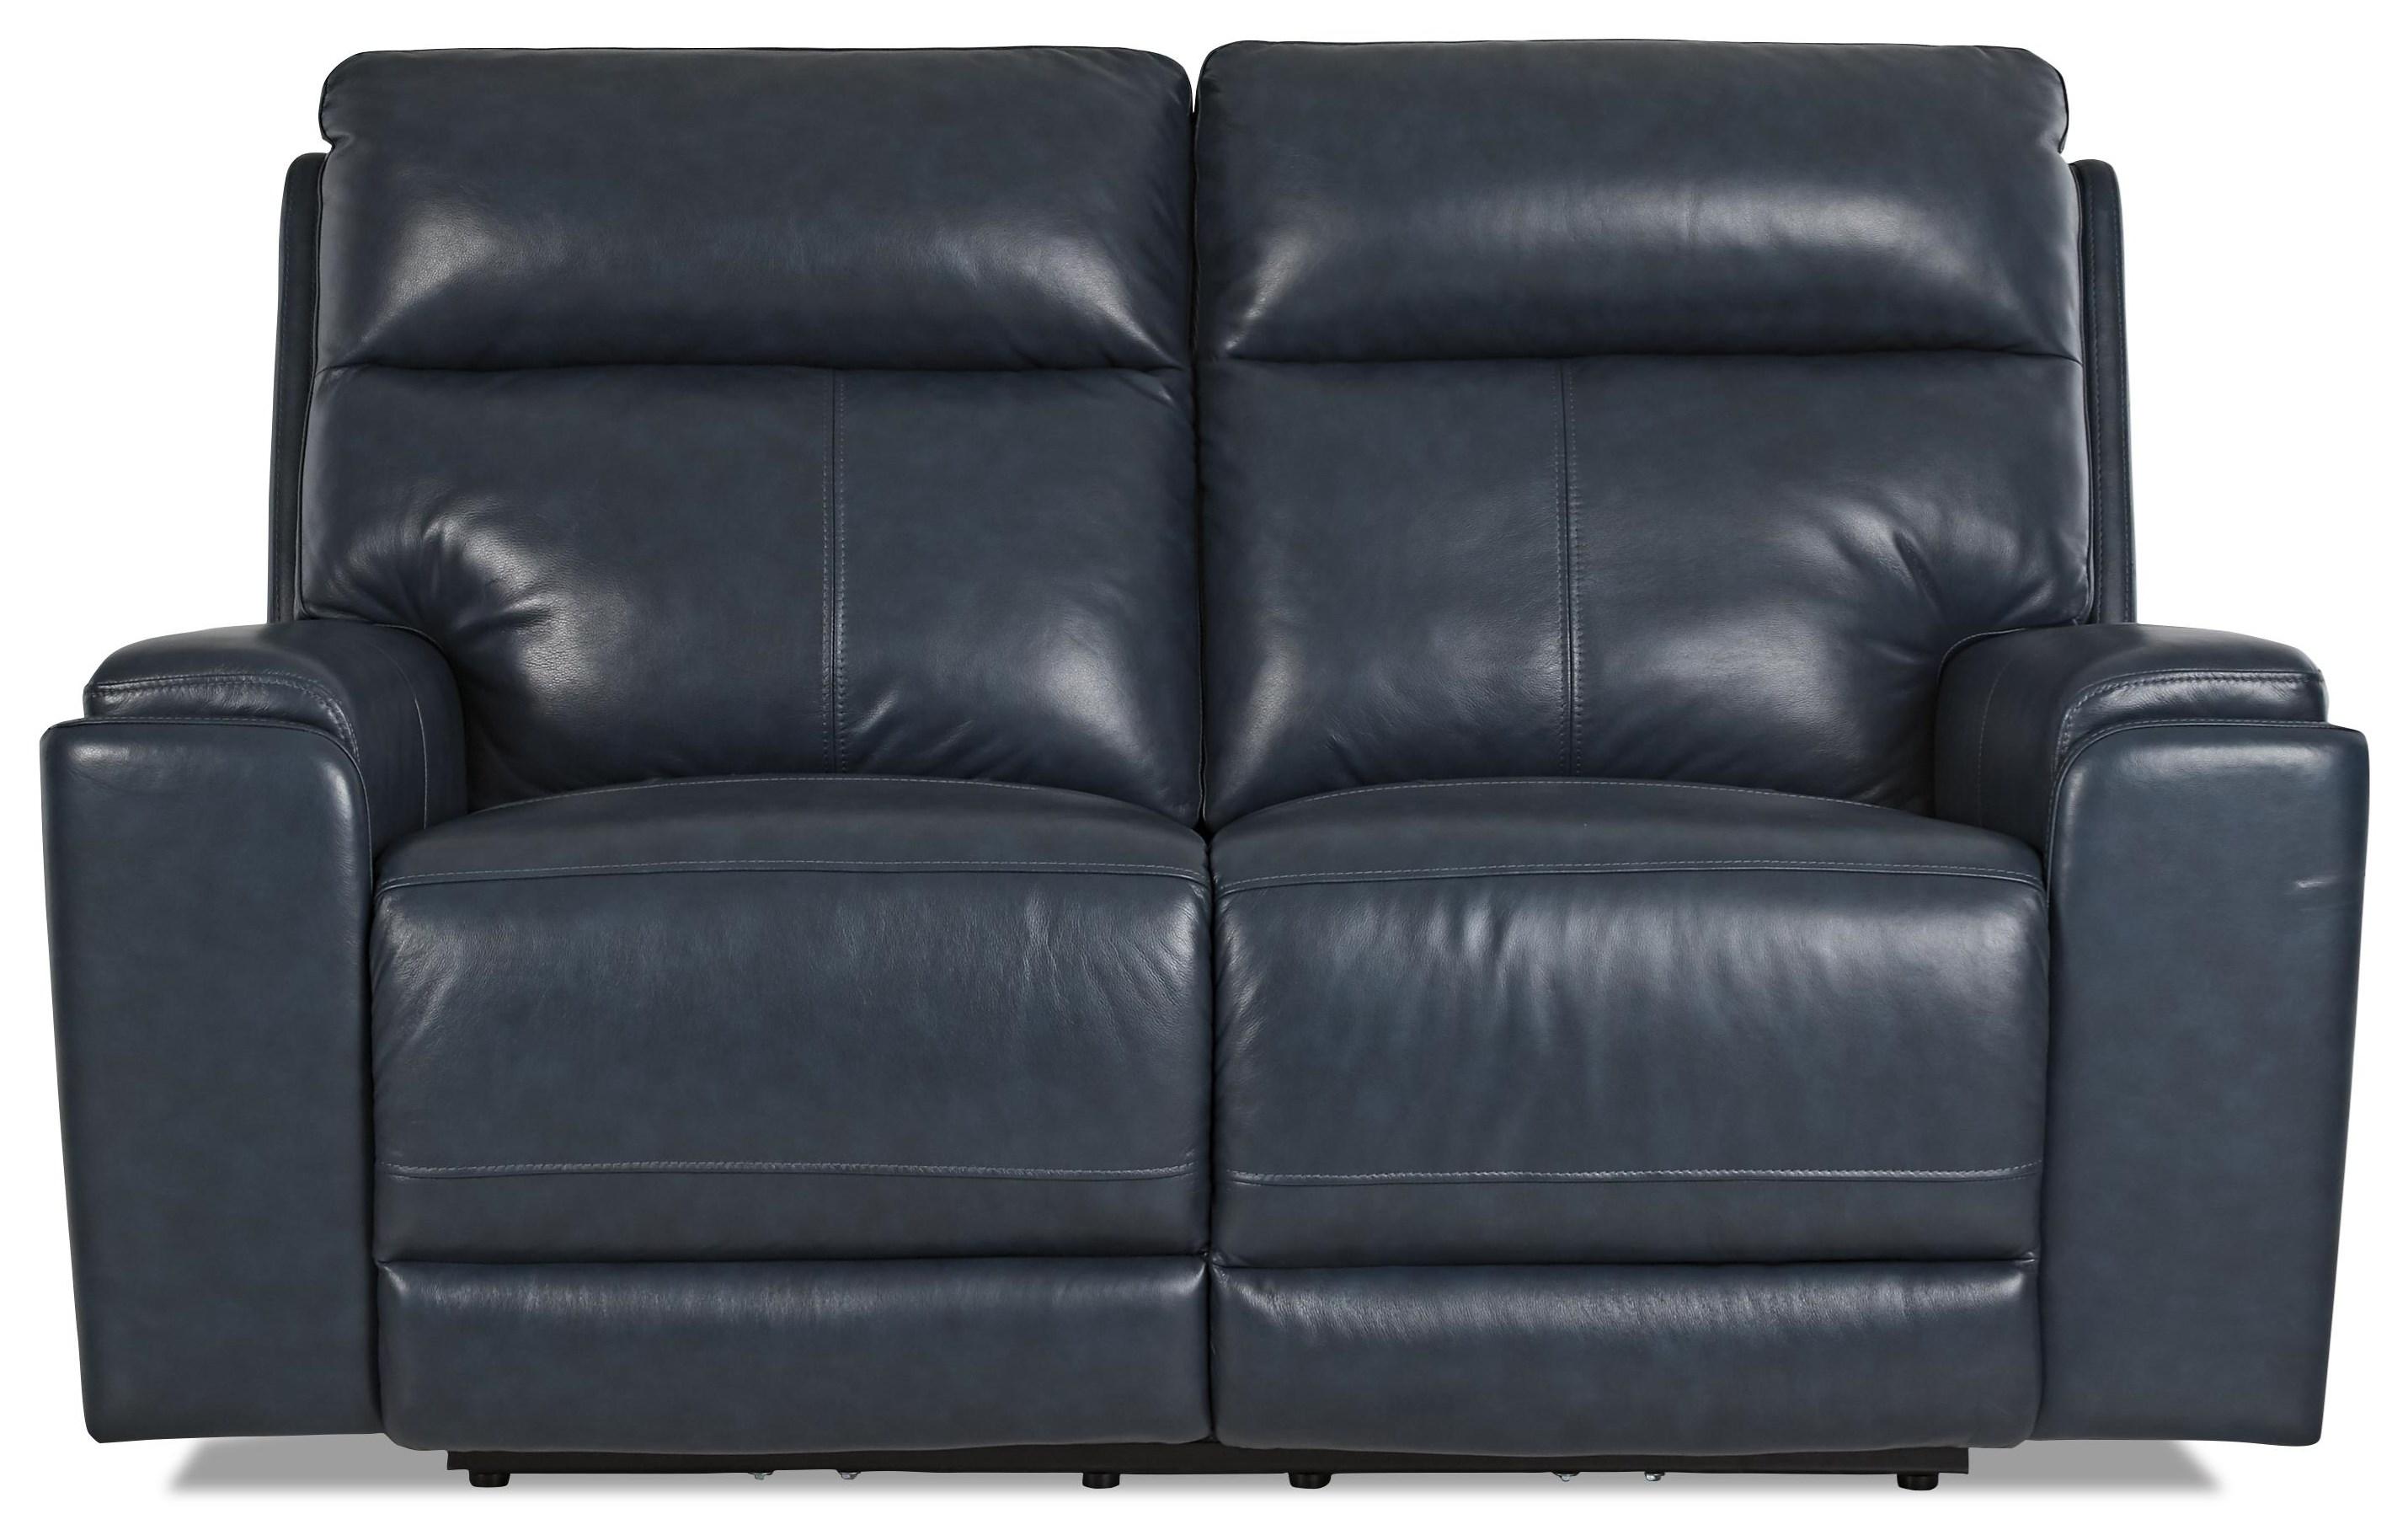 Santana Power Reclining Loveseat w/ Pwr Headrests by Klaussner International at HomeWorld Furniture